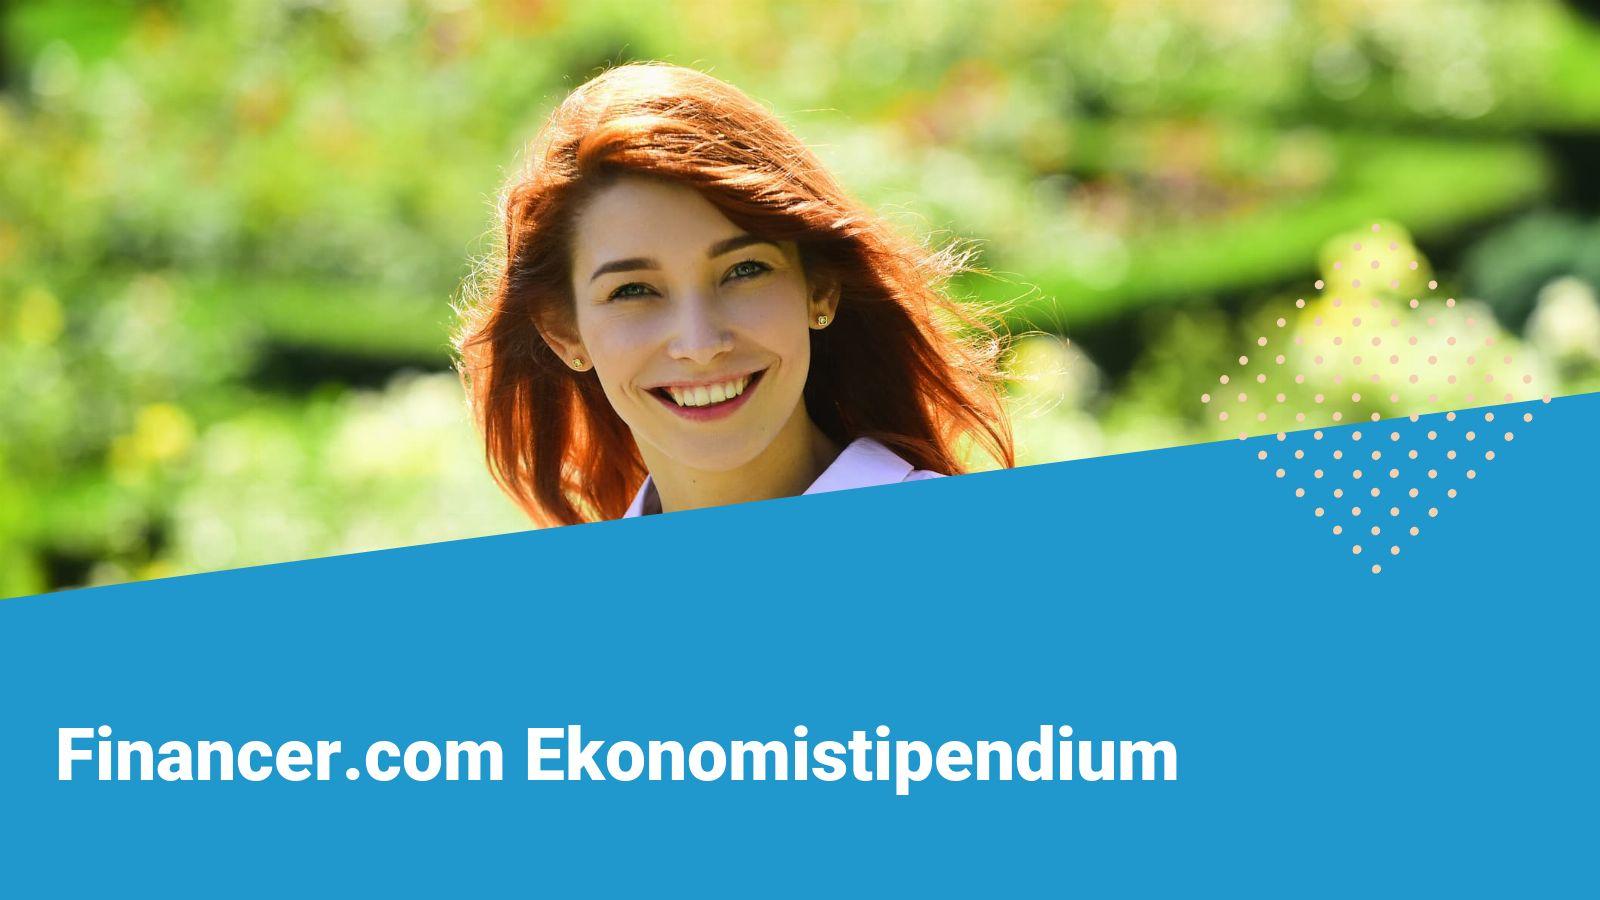 Student Financer.com Ekonomistipendium